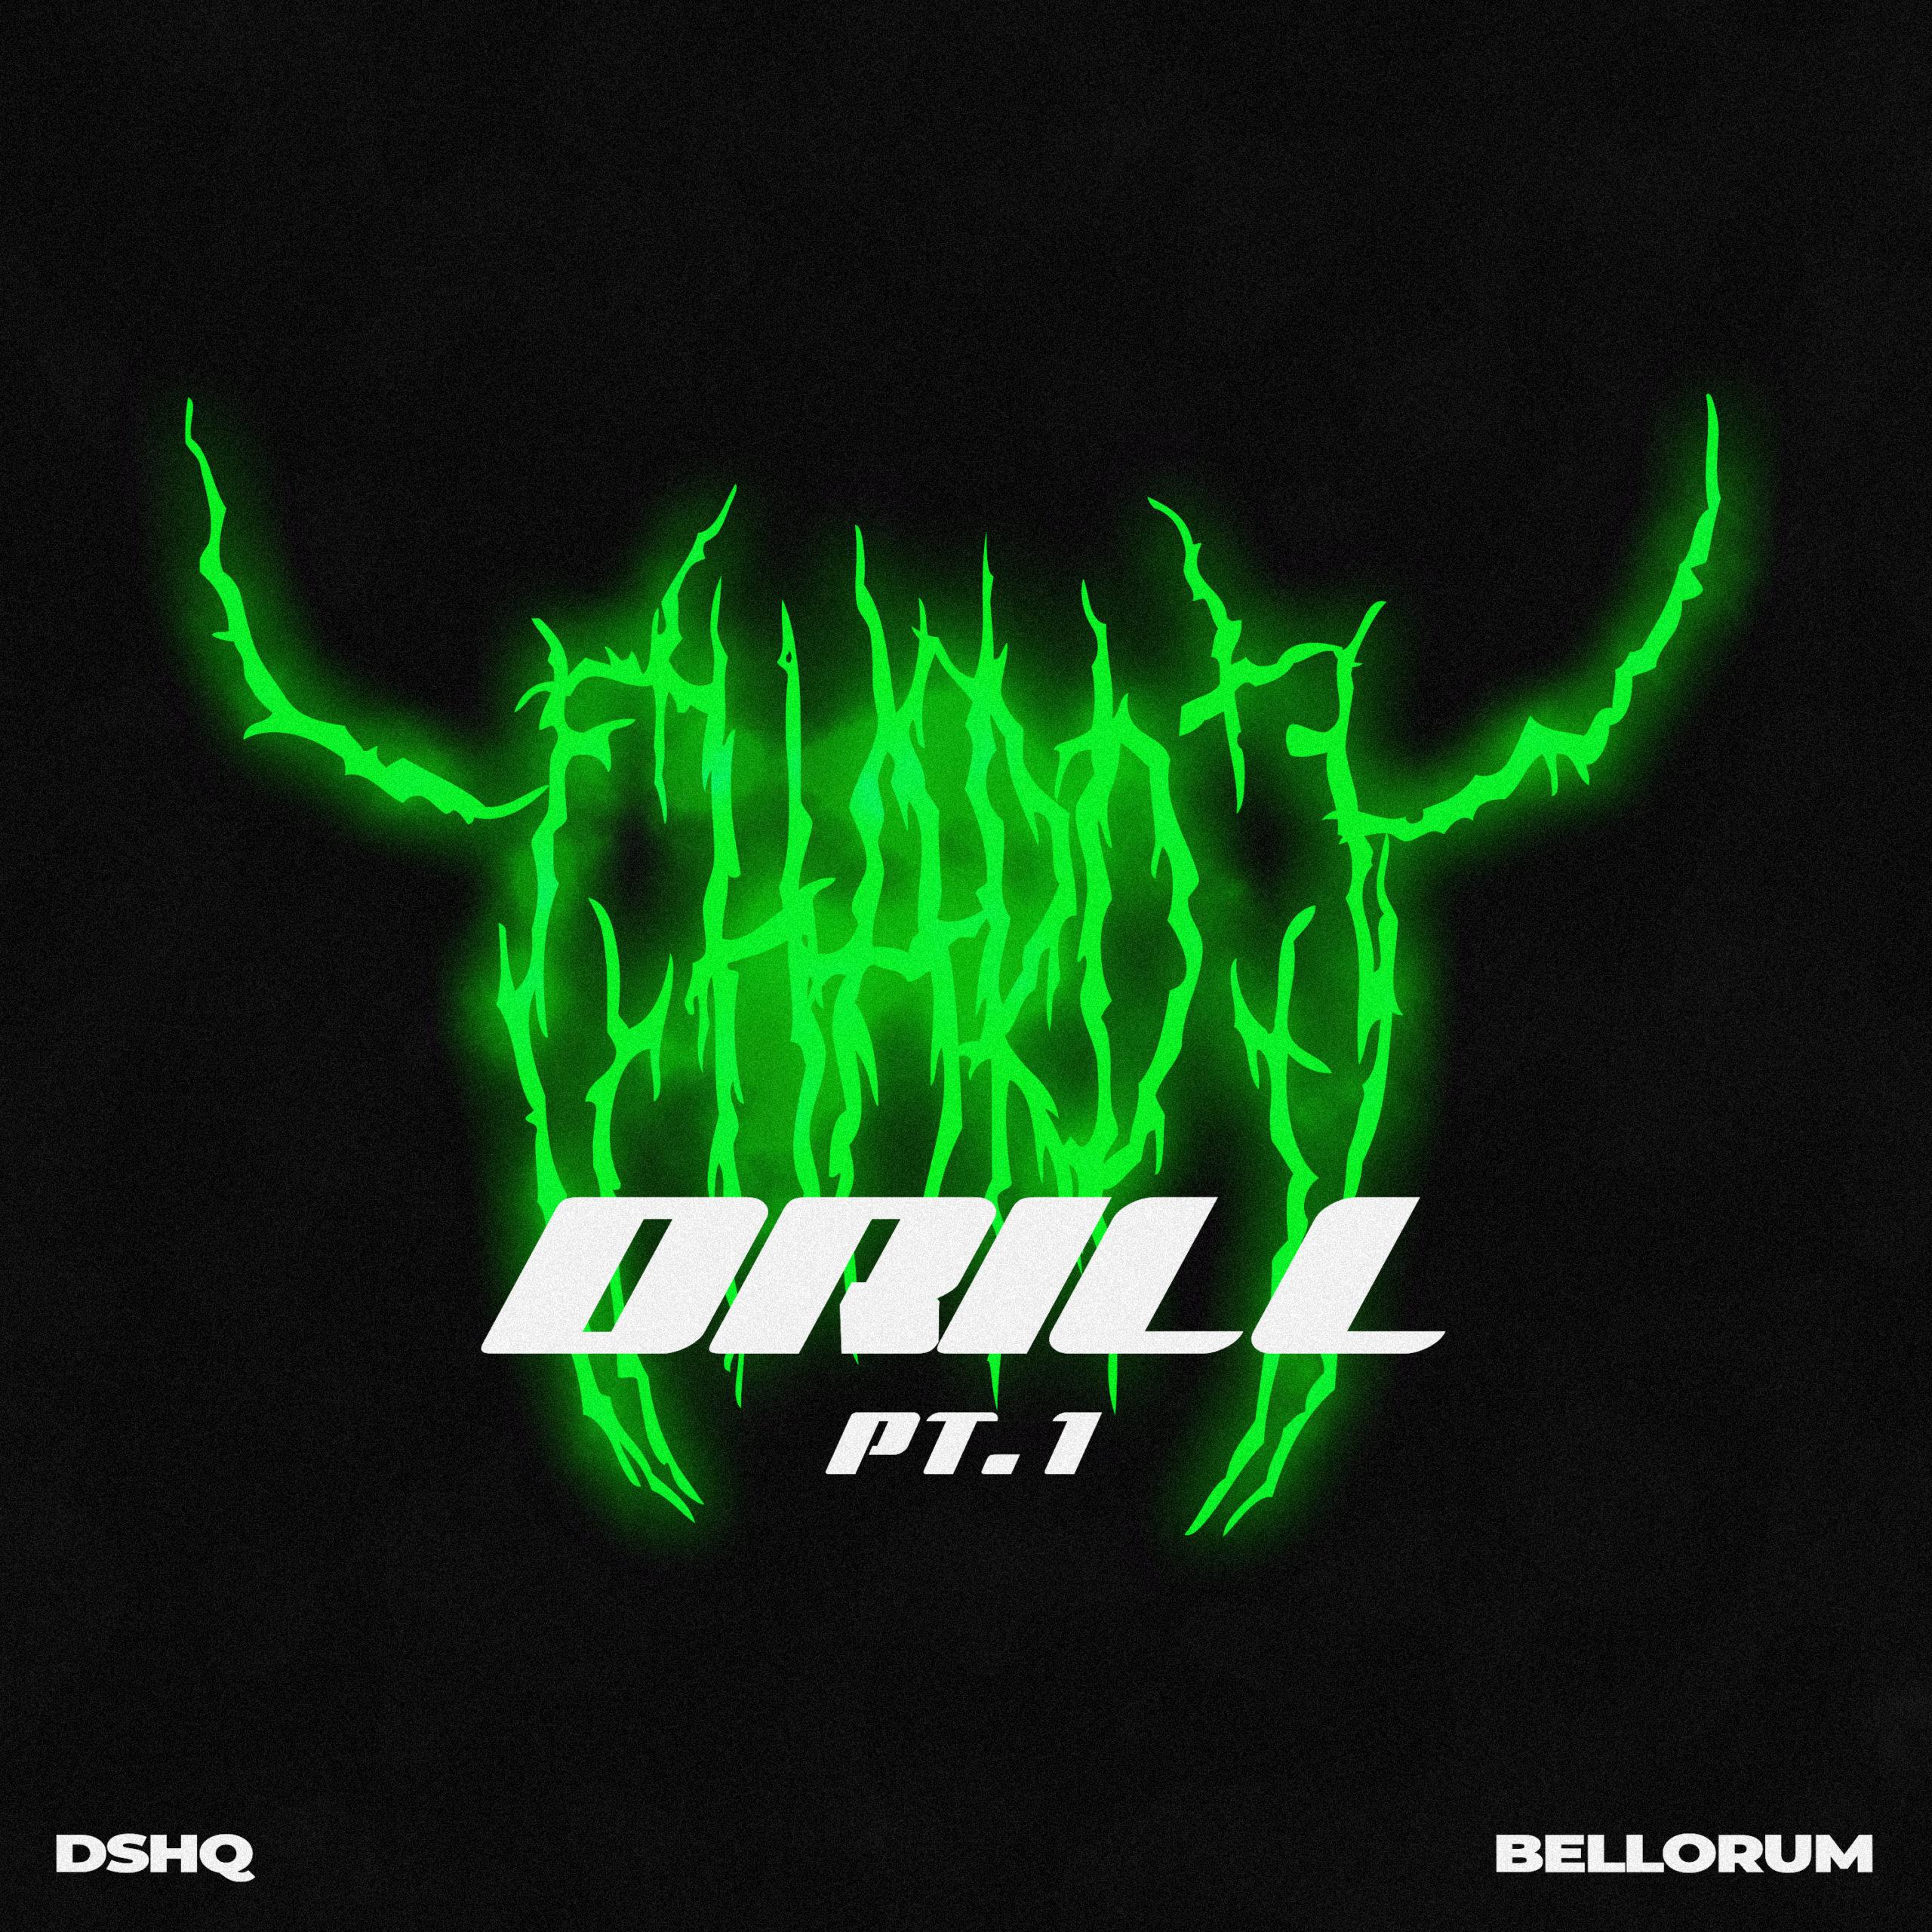 Bellorum Hard Drill